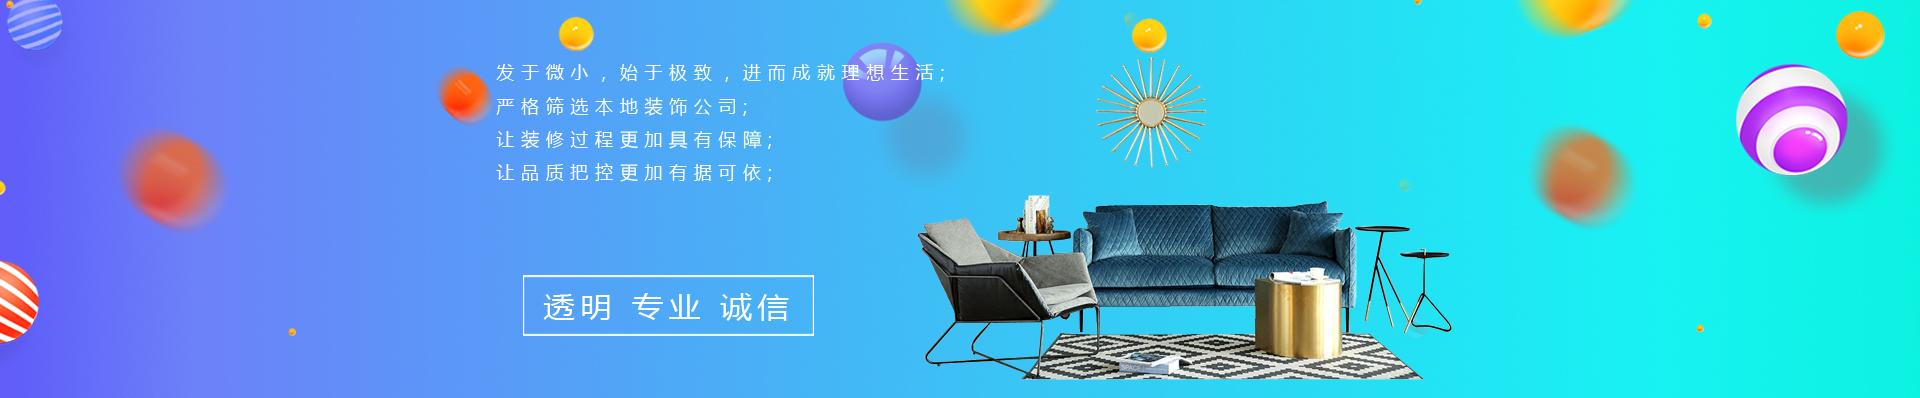 banner滚动广告